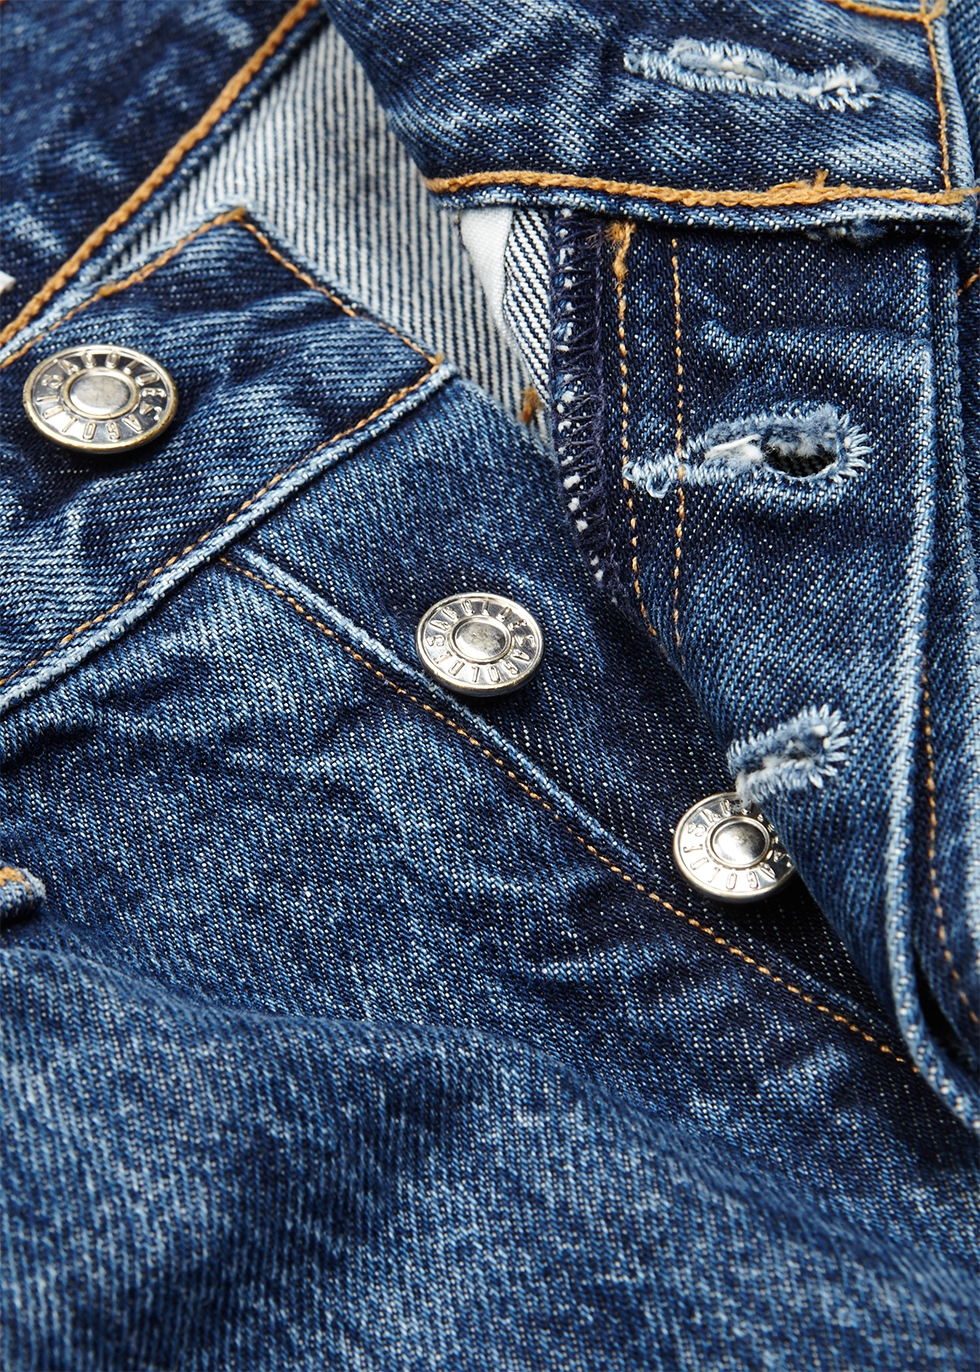 90s dark blue denim jeans - AGOLDE